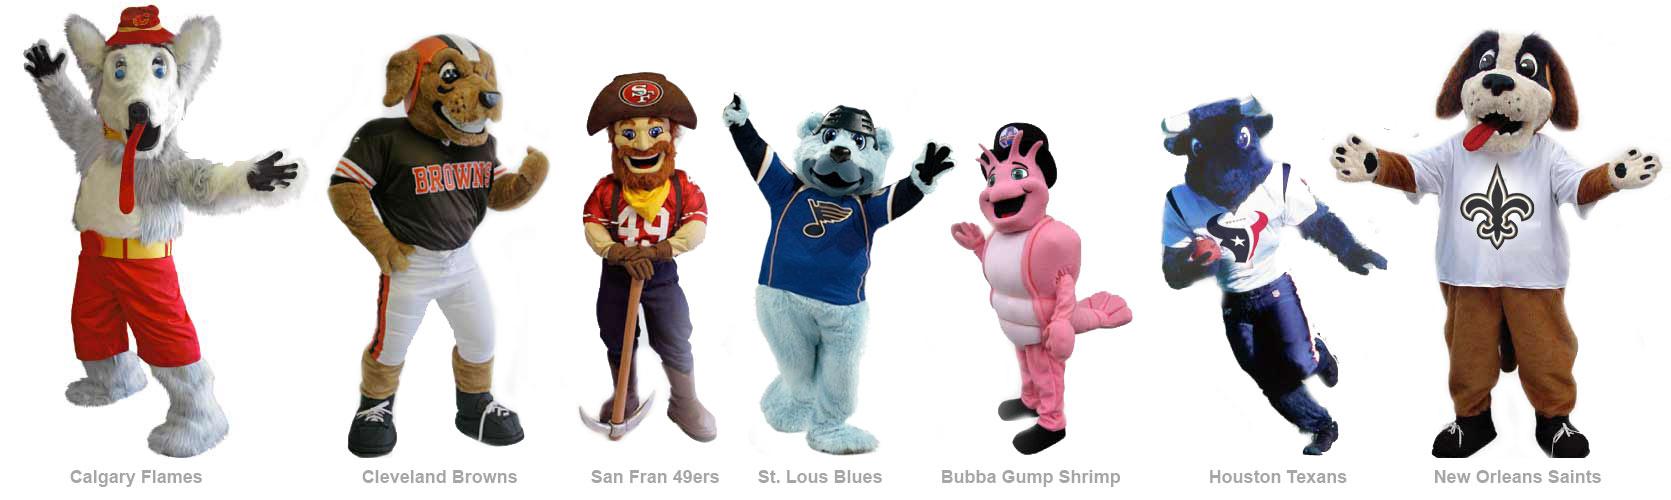 Sports Team Mascots College Mascots Corporate Mascots